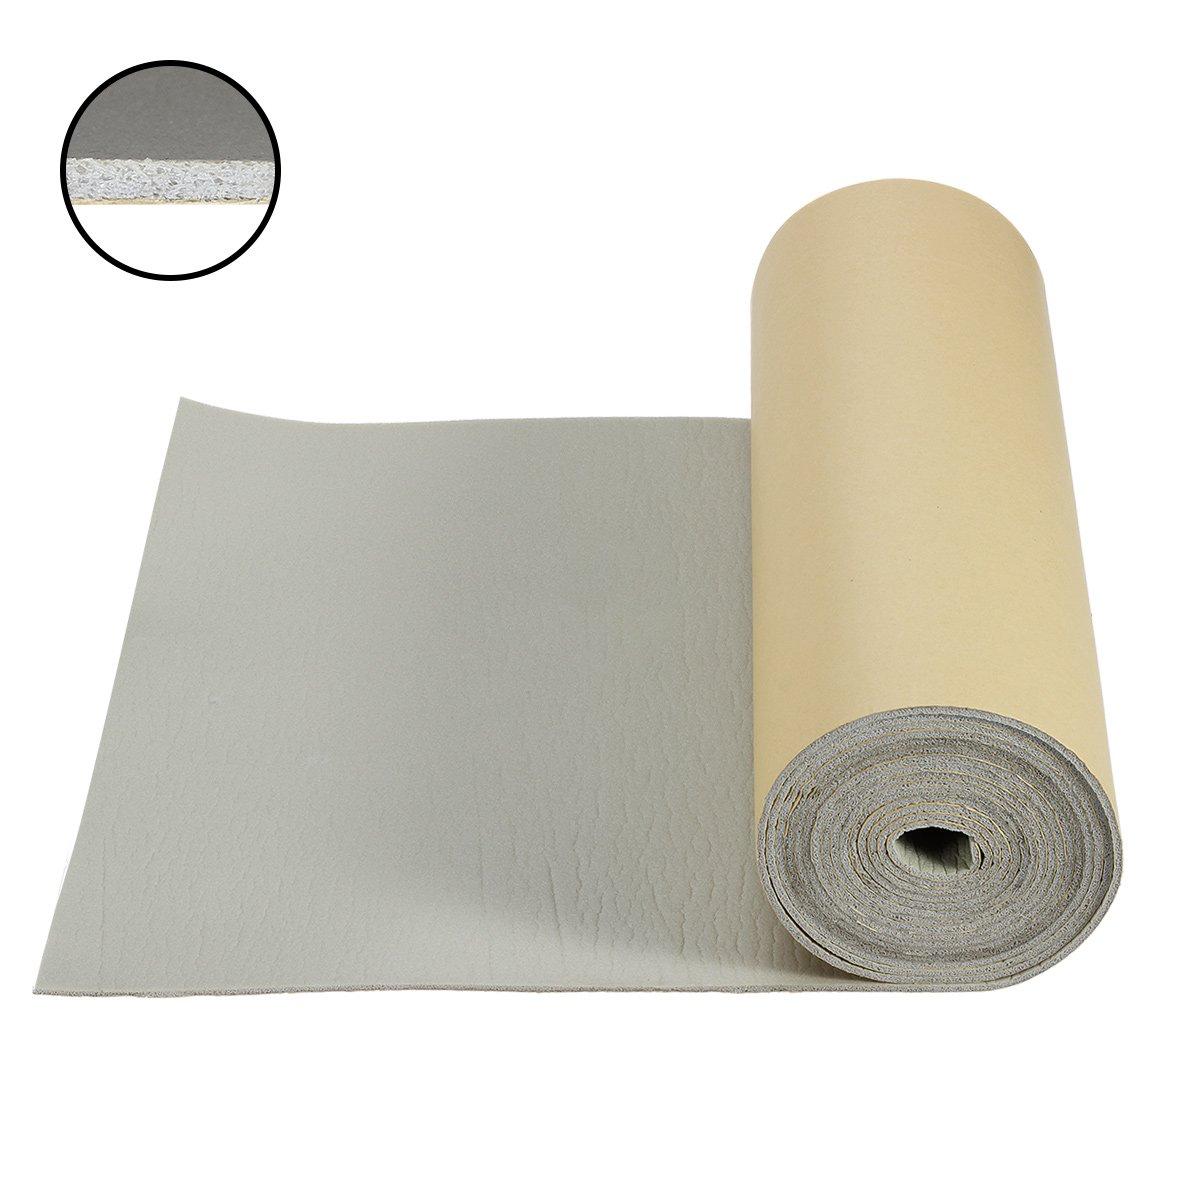 Partsam 157 mil 37.5 sqft Car Sound Deadening Mat,Heat Insulation Blocker Pad,Closed Cell PE Foam Cool Liner,Self-adhesive Sound Deadener,Thickness Sound Dampening Material